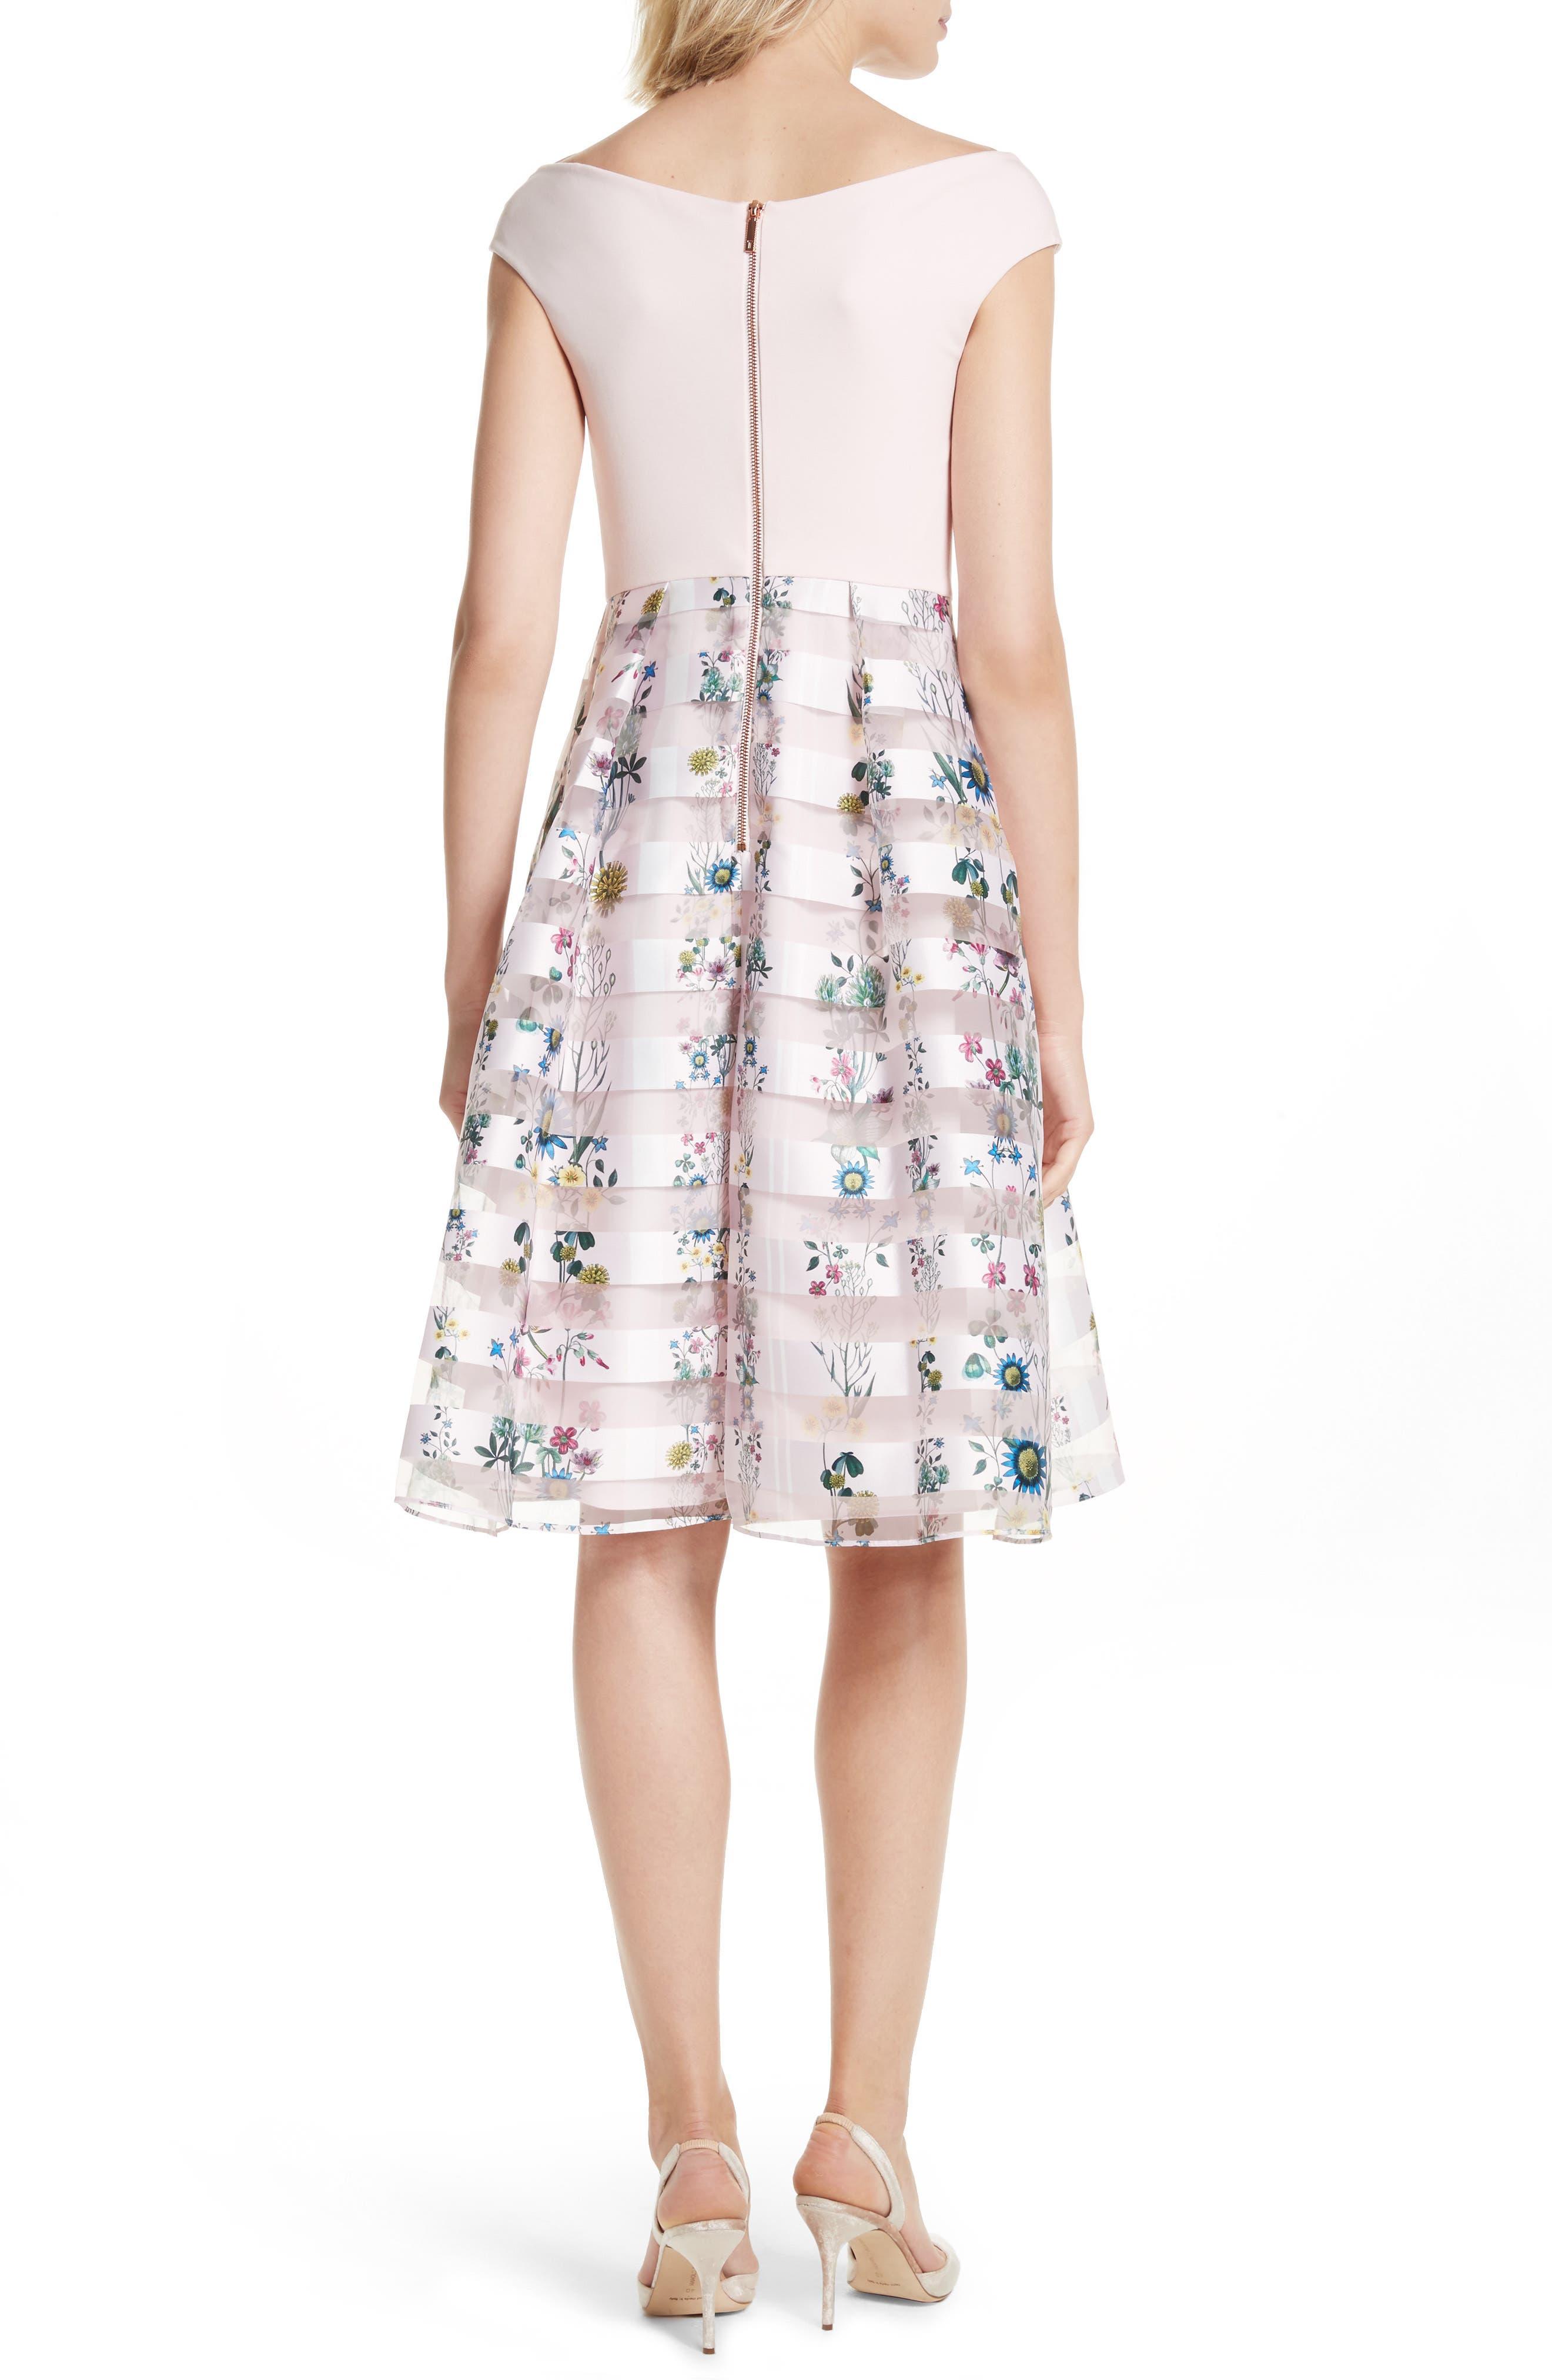 Lulou Unity Floral Off the Shoulder Dress,                             Alternate thumbnail 2, color,                             672